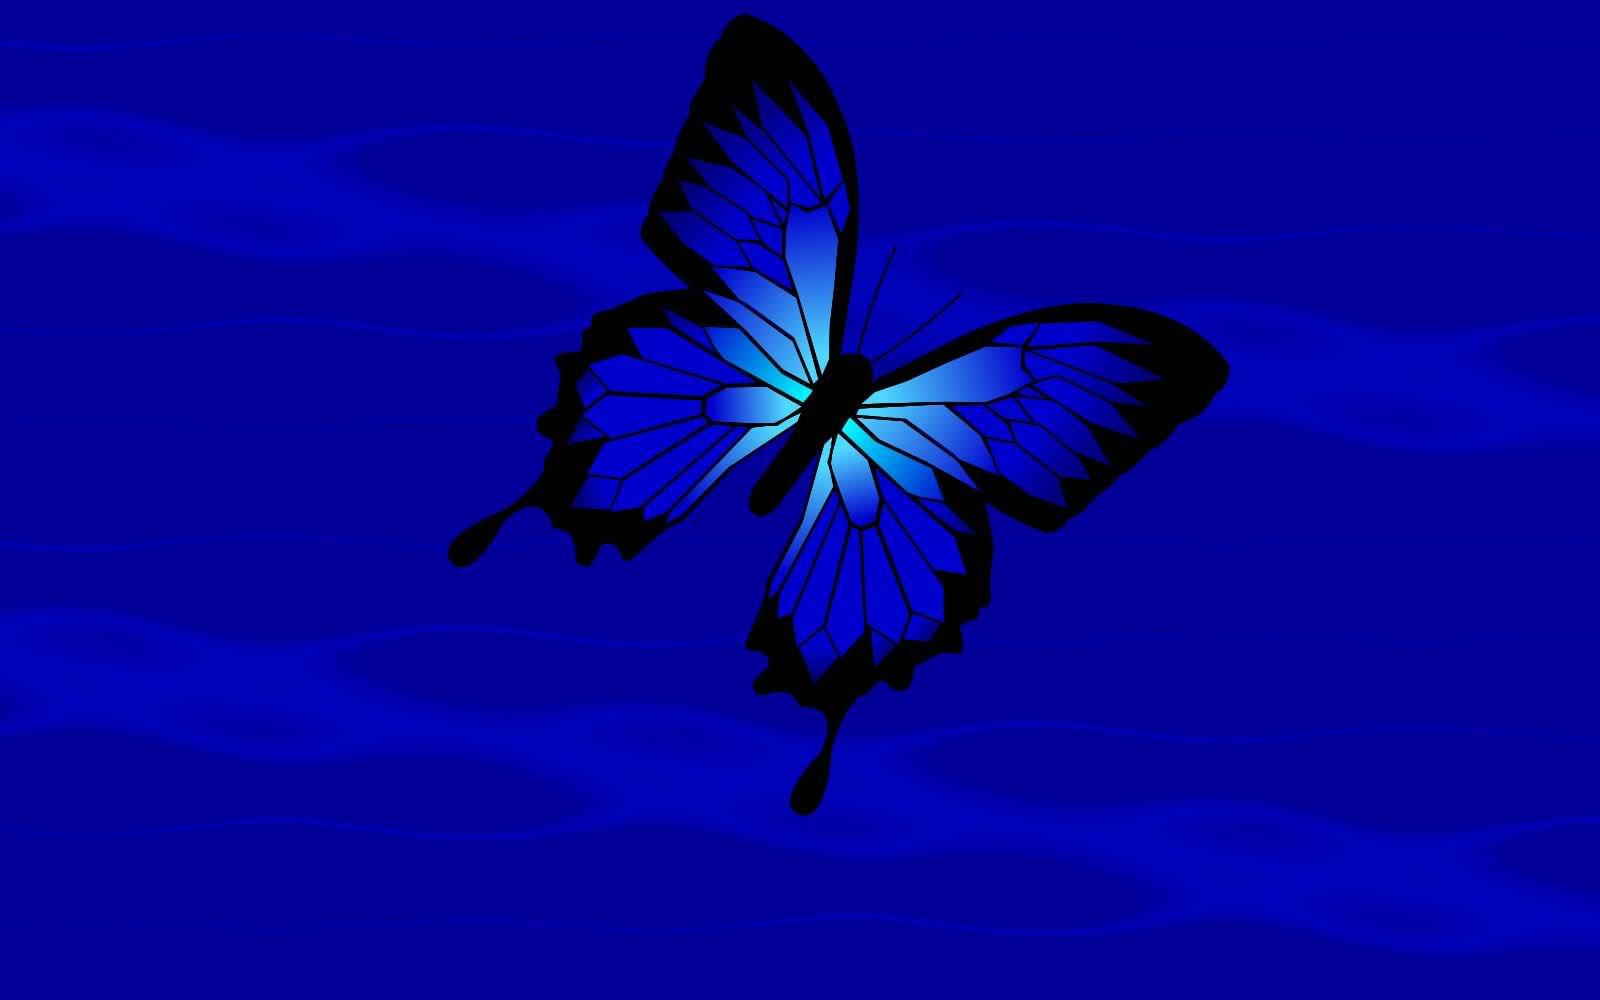 Blue Butterfly Wallpaper 9353 Hd Wallpapers in Cute   Imagescicom 1600x1000